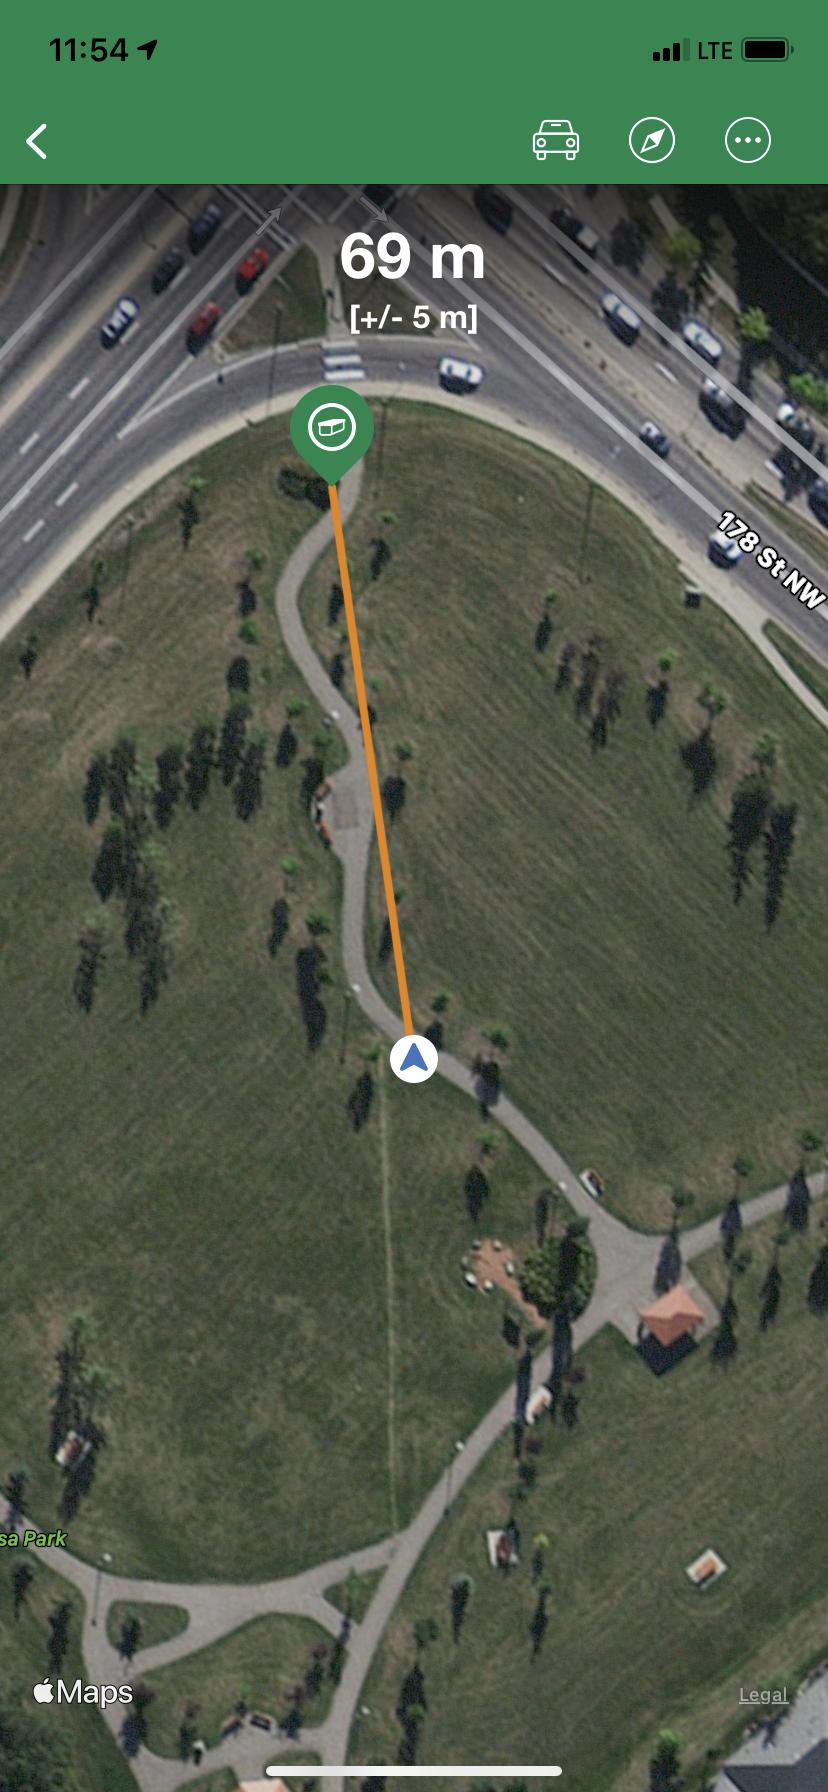 GPS image at 178 St. & 95 Ave.